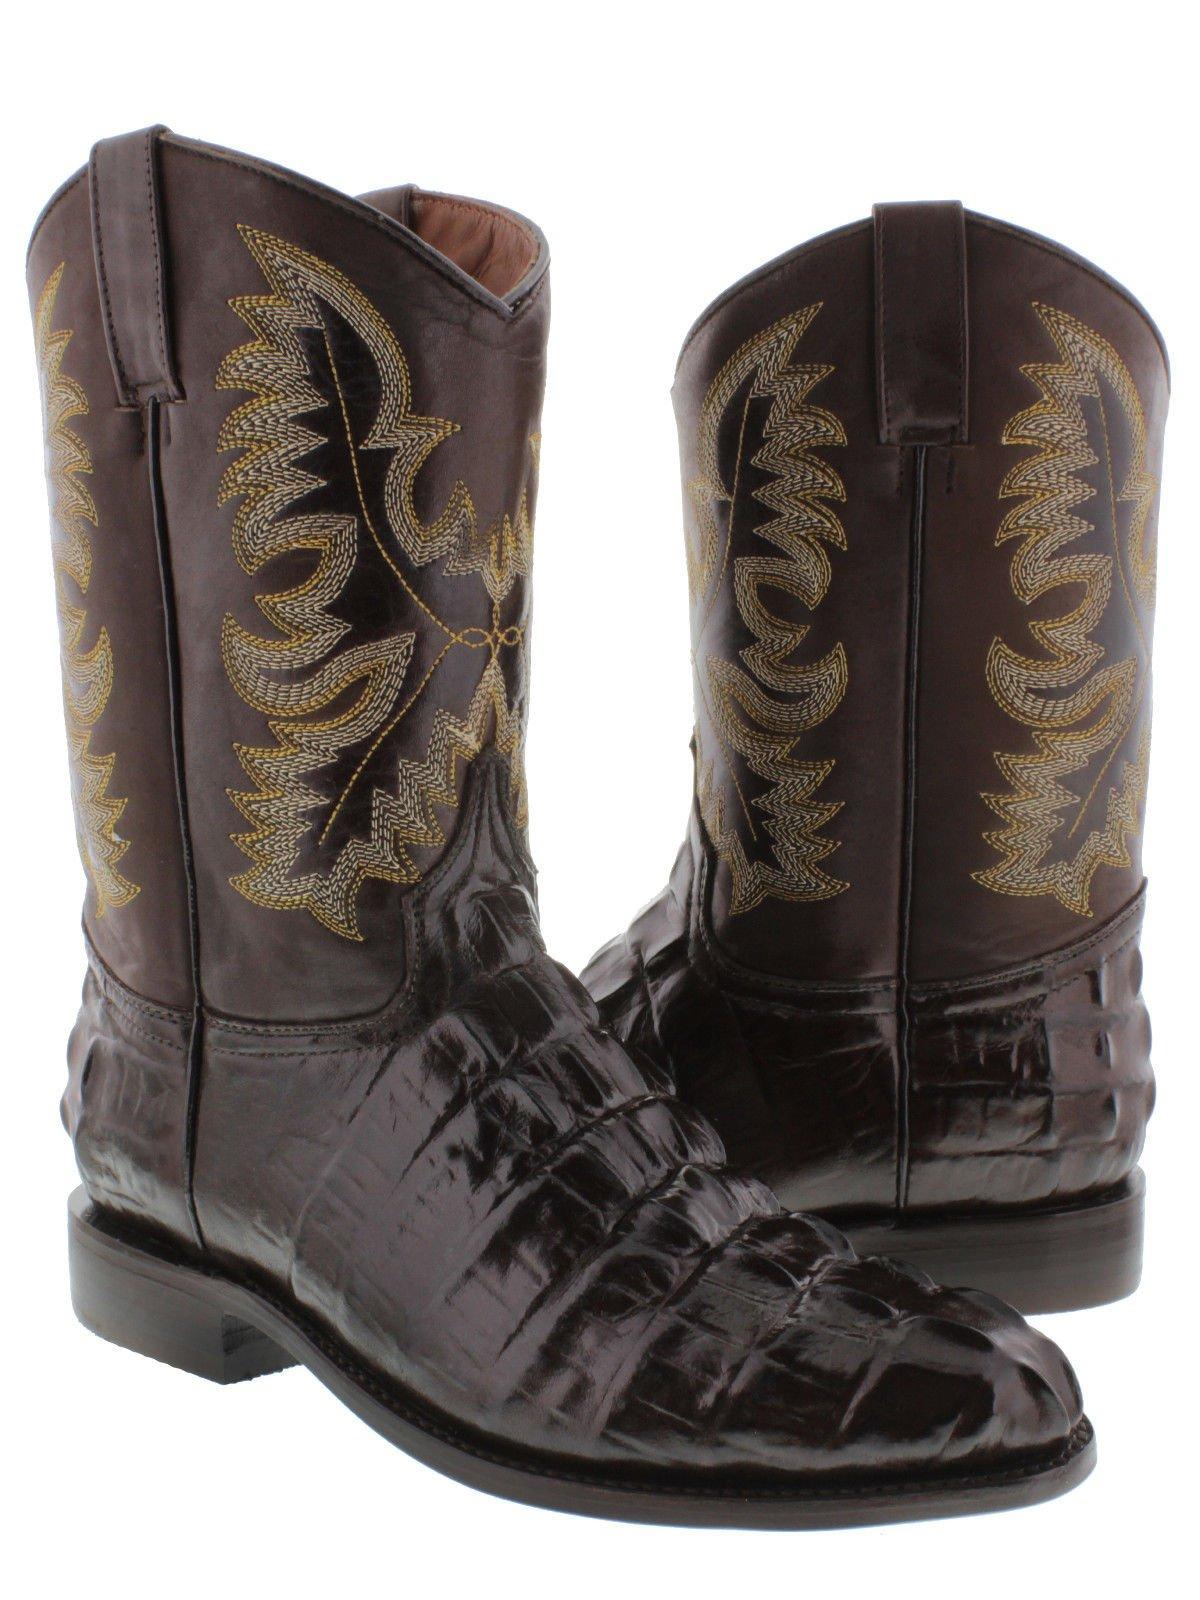 El Presidente - Men's Brown Crocodile Tail Design Leather Cowboy Boots Roper 12.5 D